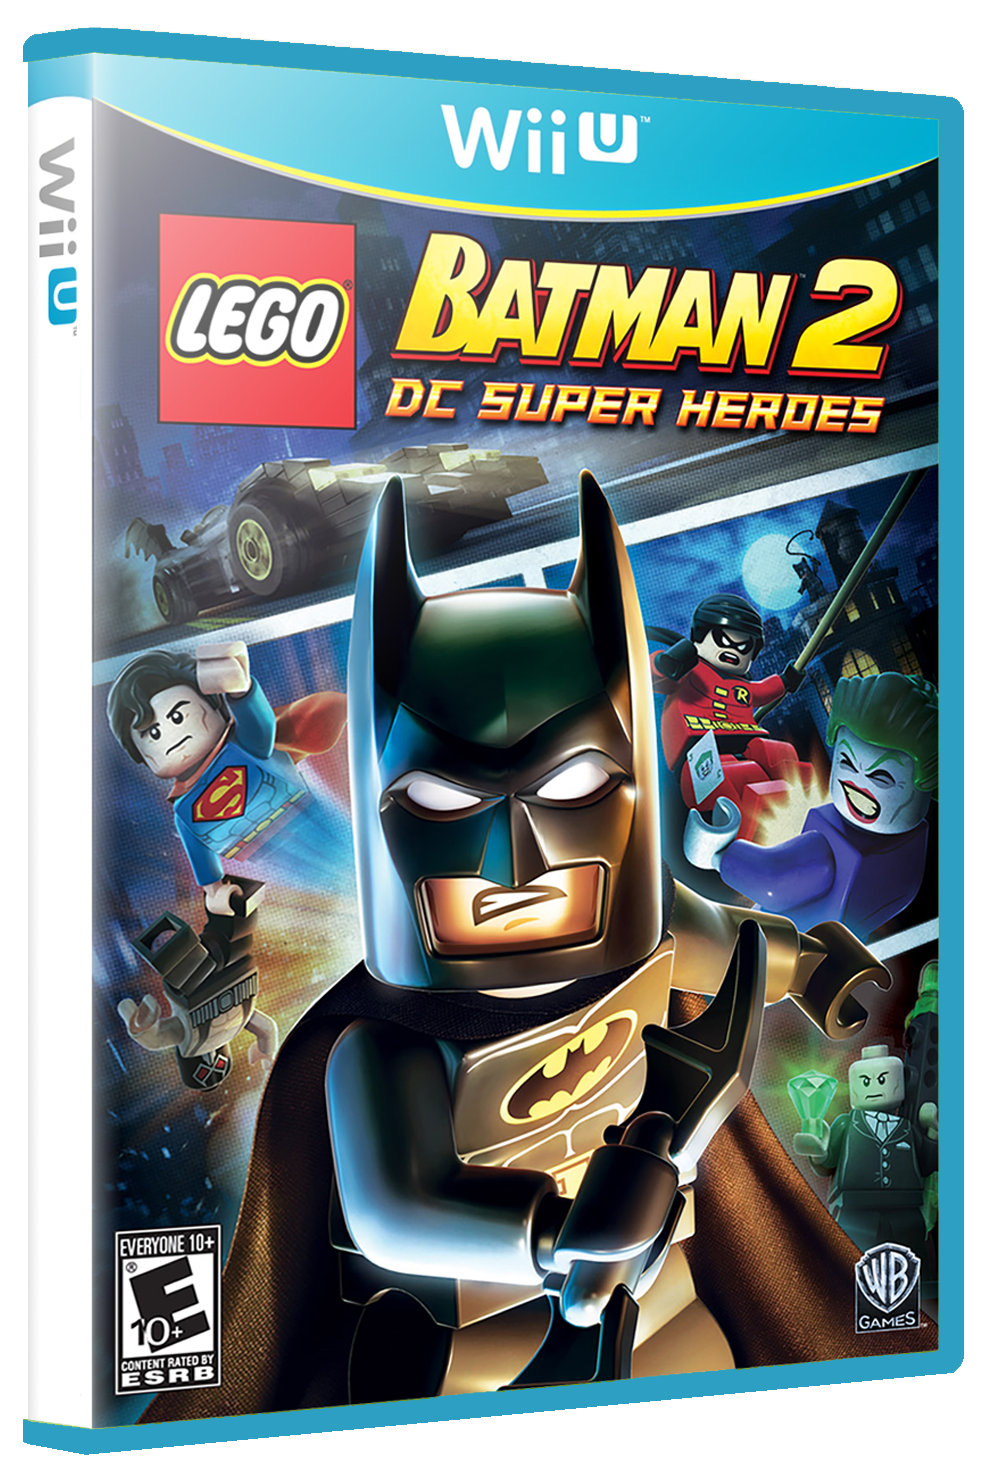 LEGO Batman 2: DC Super Heroes Details - LaunchBox Games ...